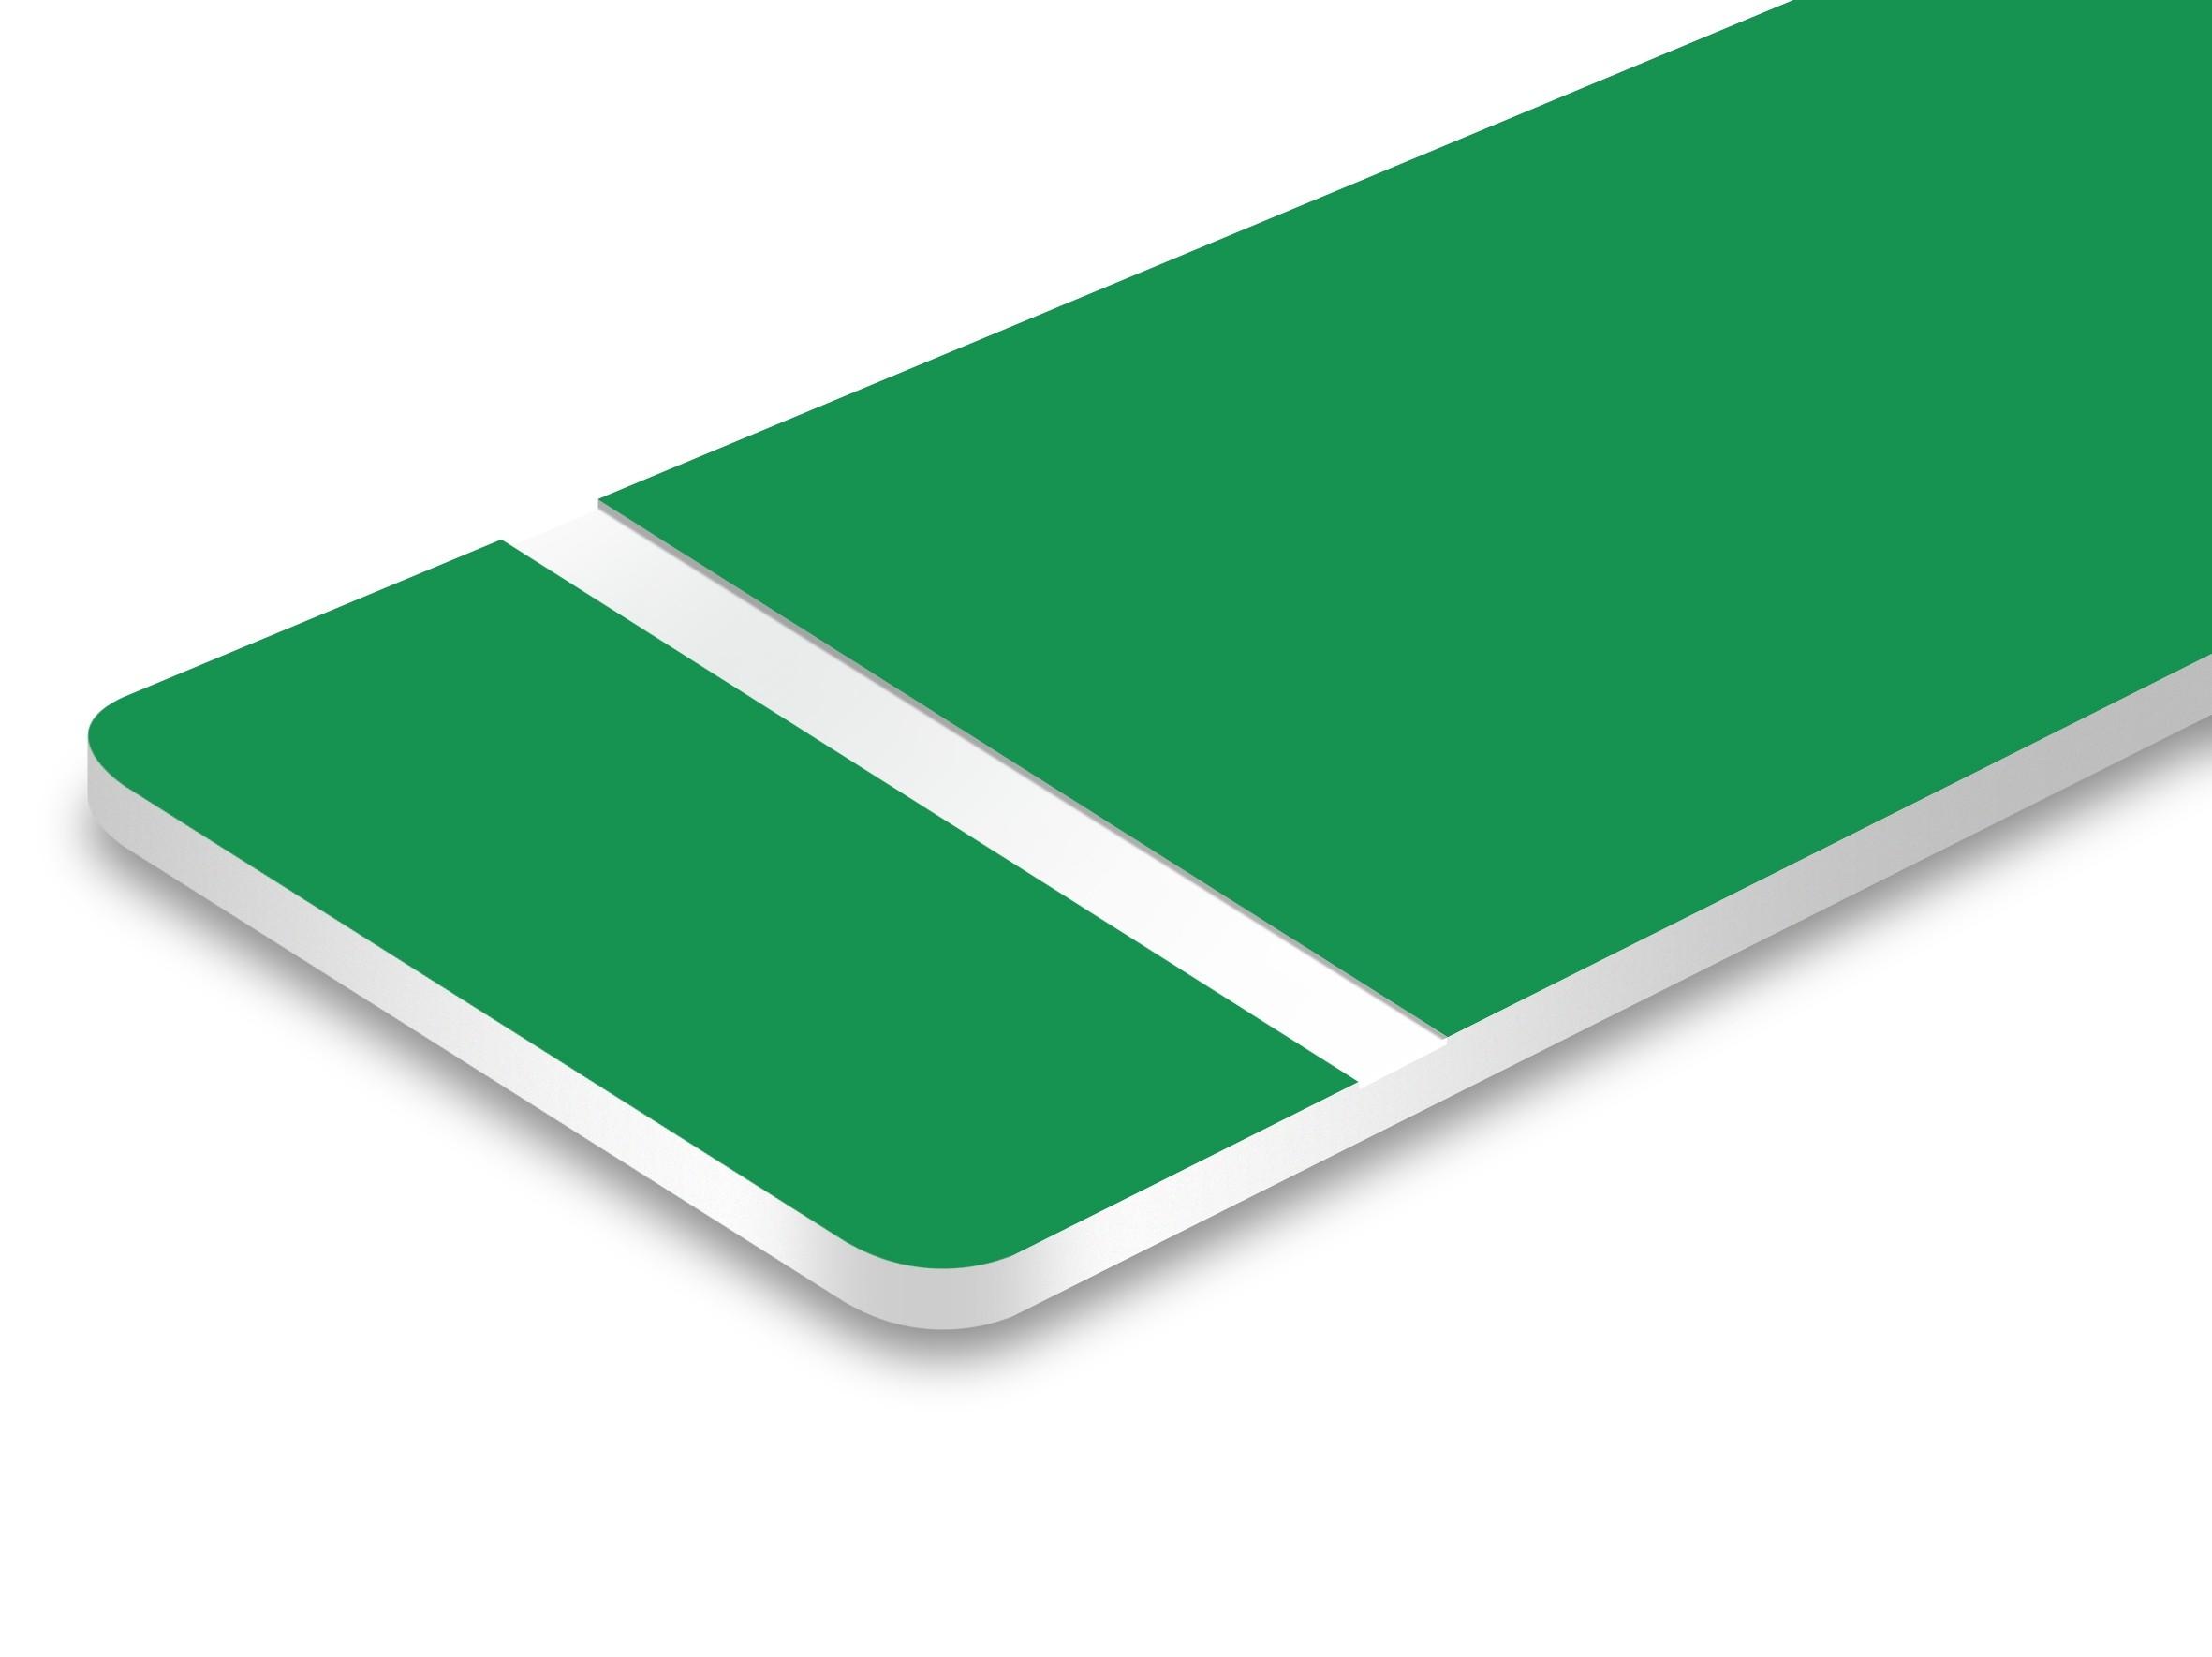 TroLase Ultra matt green/white 1.5 mm